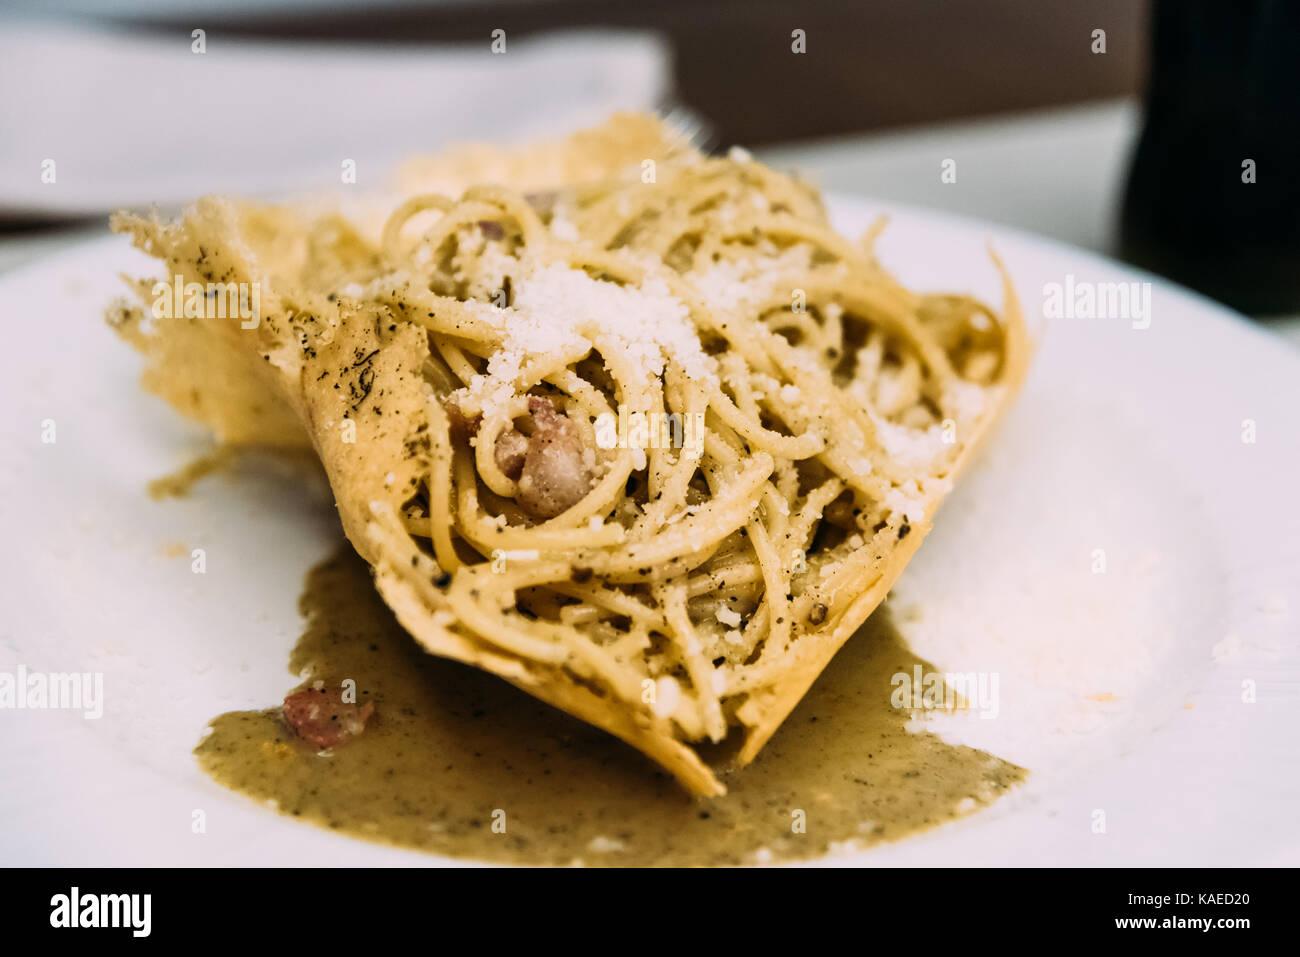 Spaghetti pasta with cheese - Stock Image